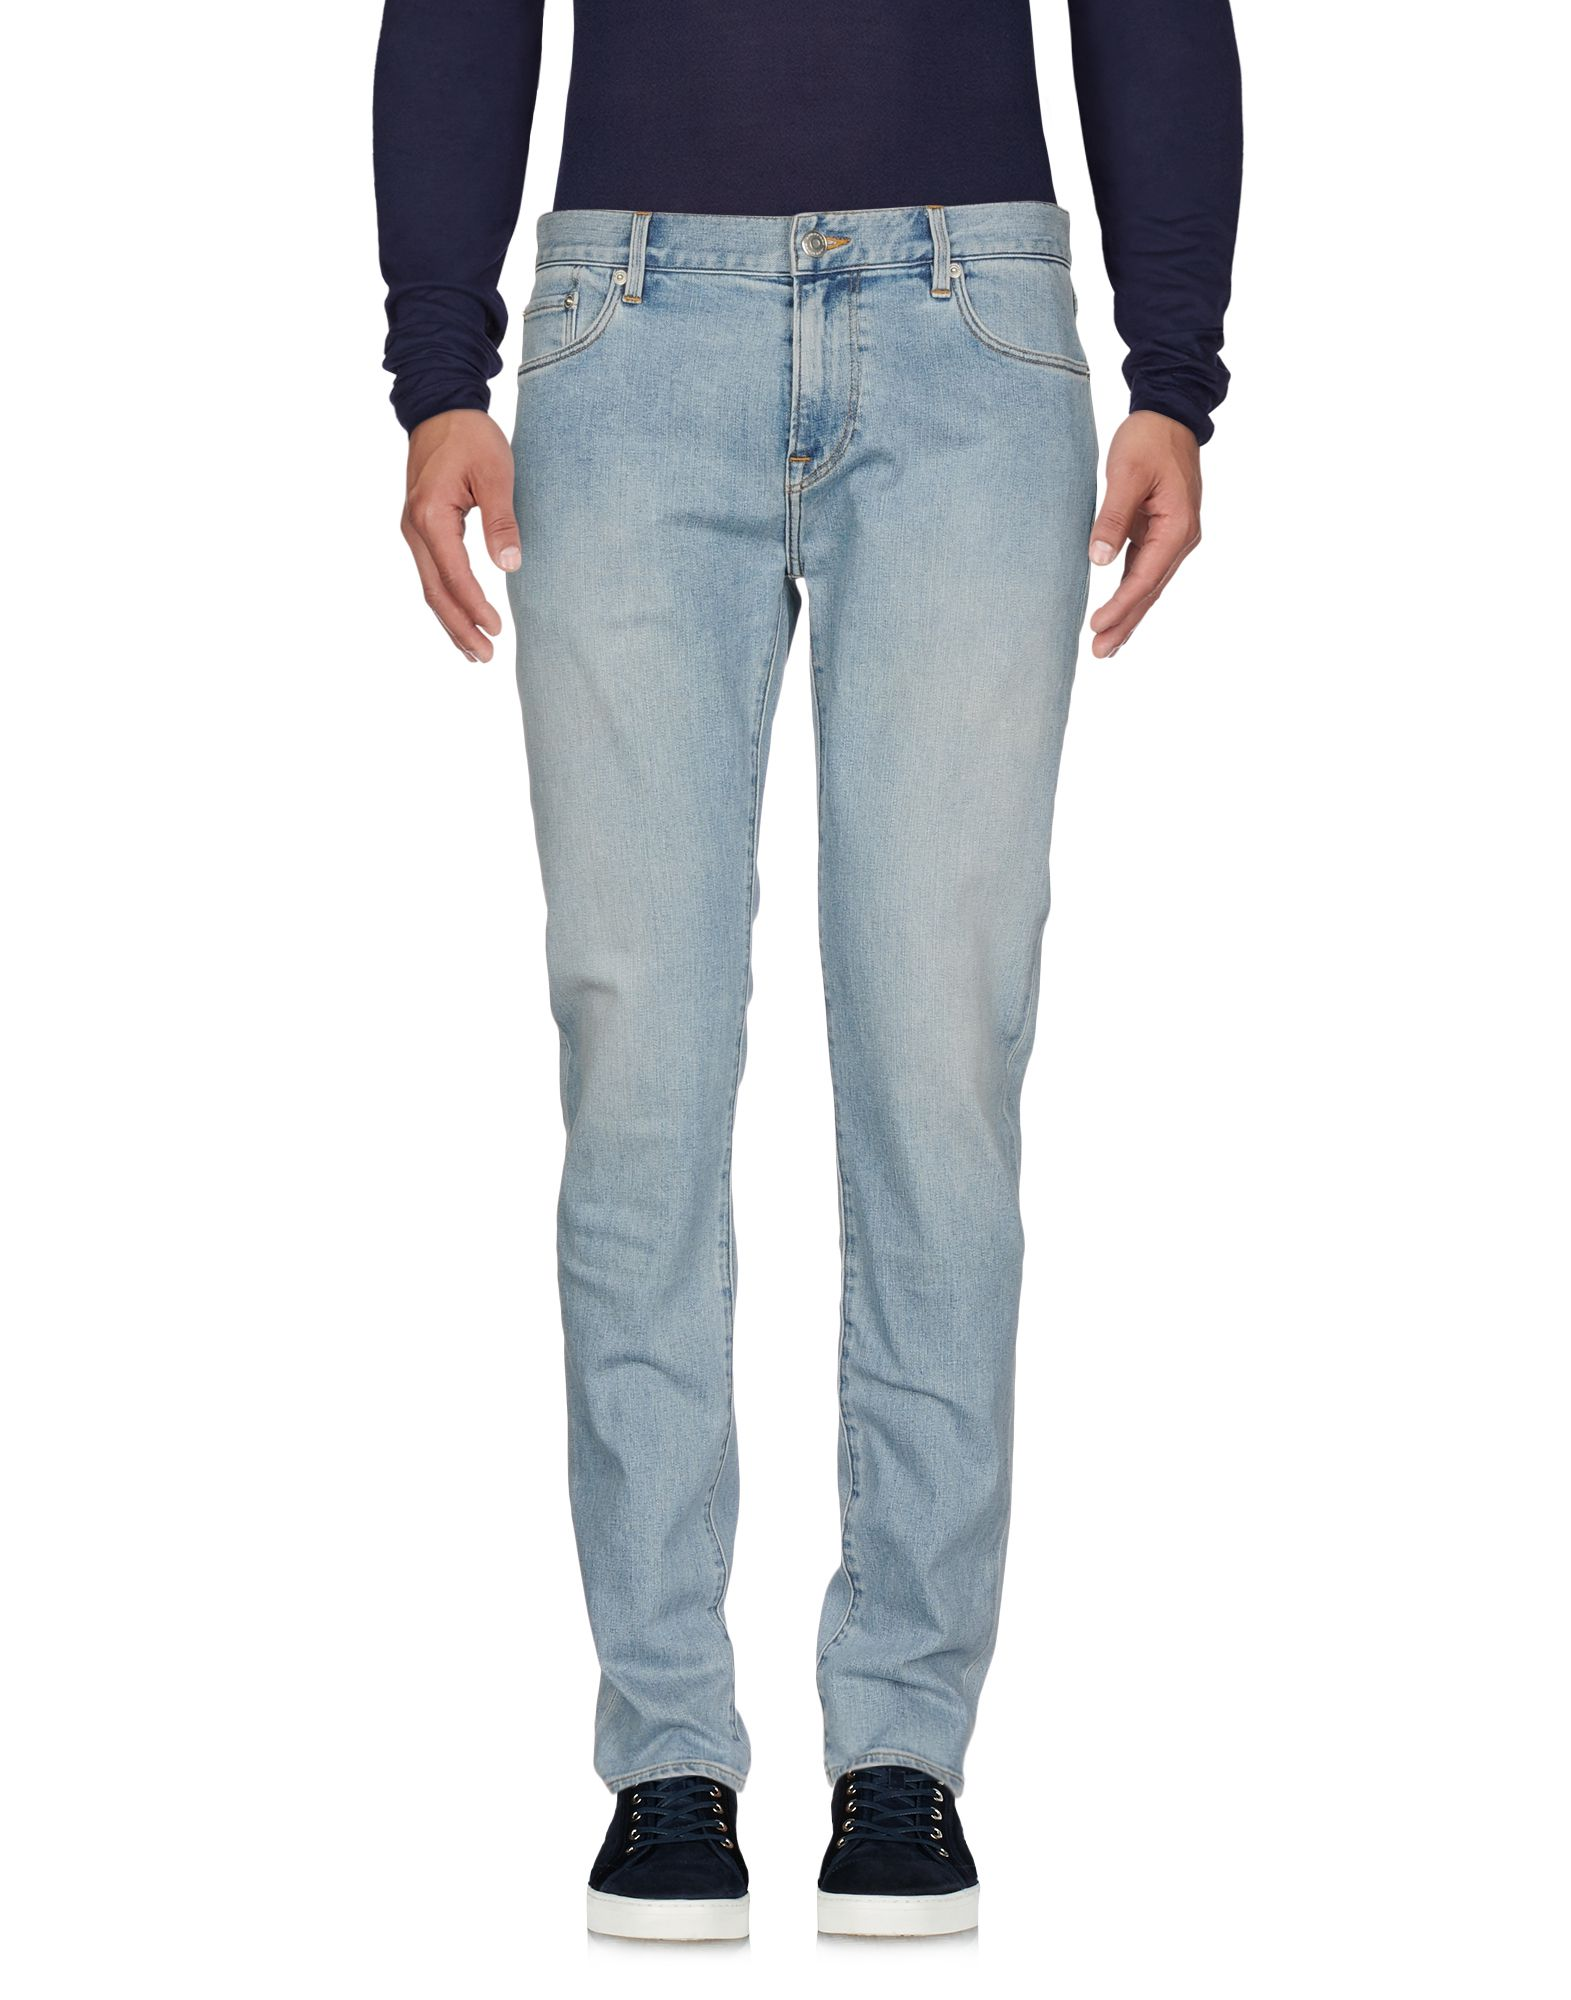 Pantaloni Jeans Burberry Donna - Acquista online su